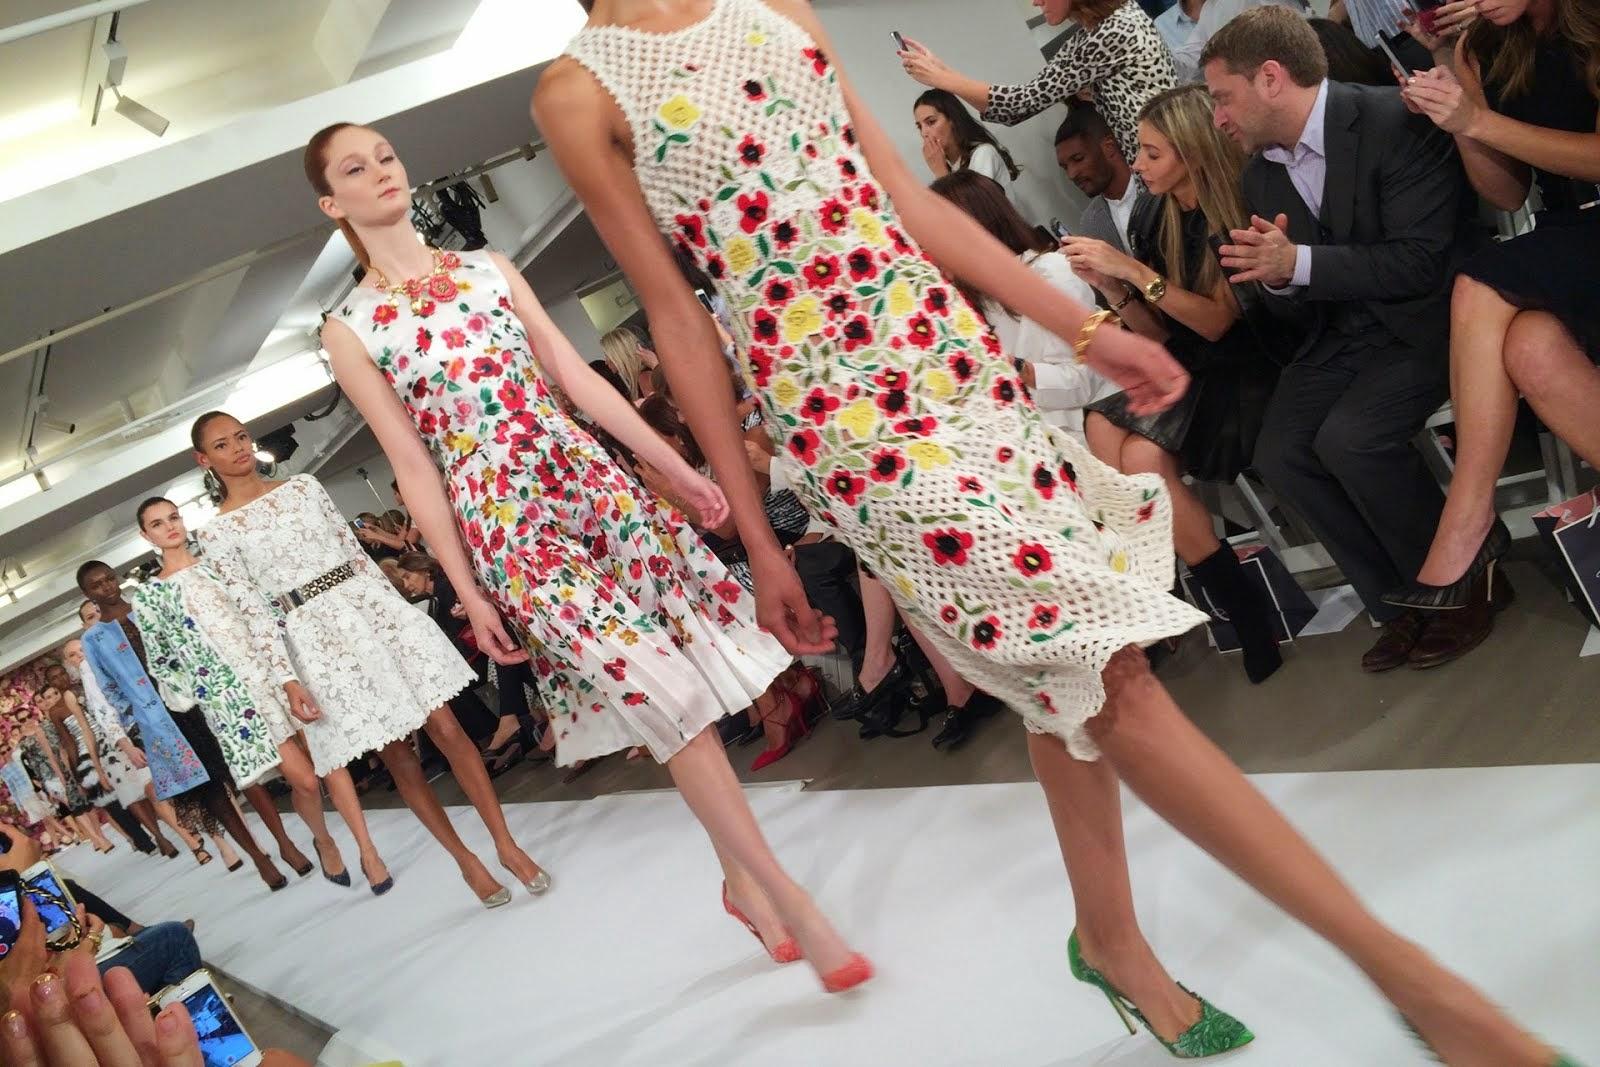 Oscar de la Renta's spring/summer 2015 floral dresses